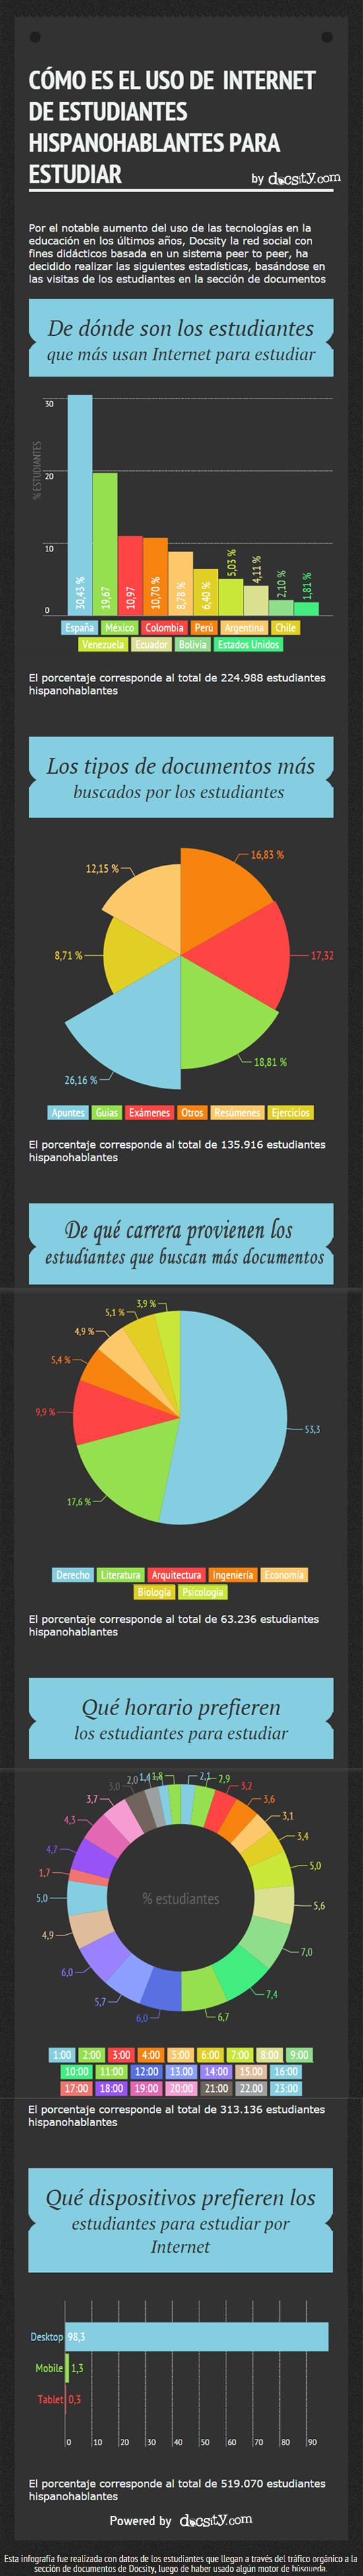 Infografia Docsity